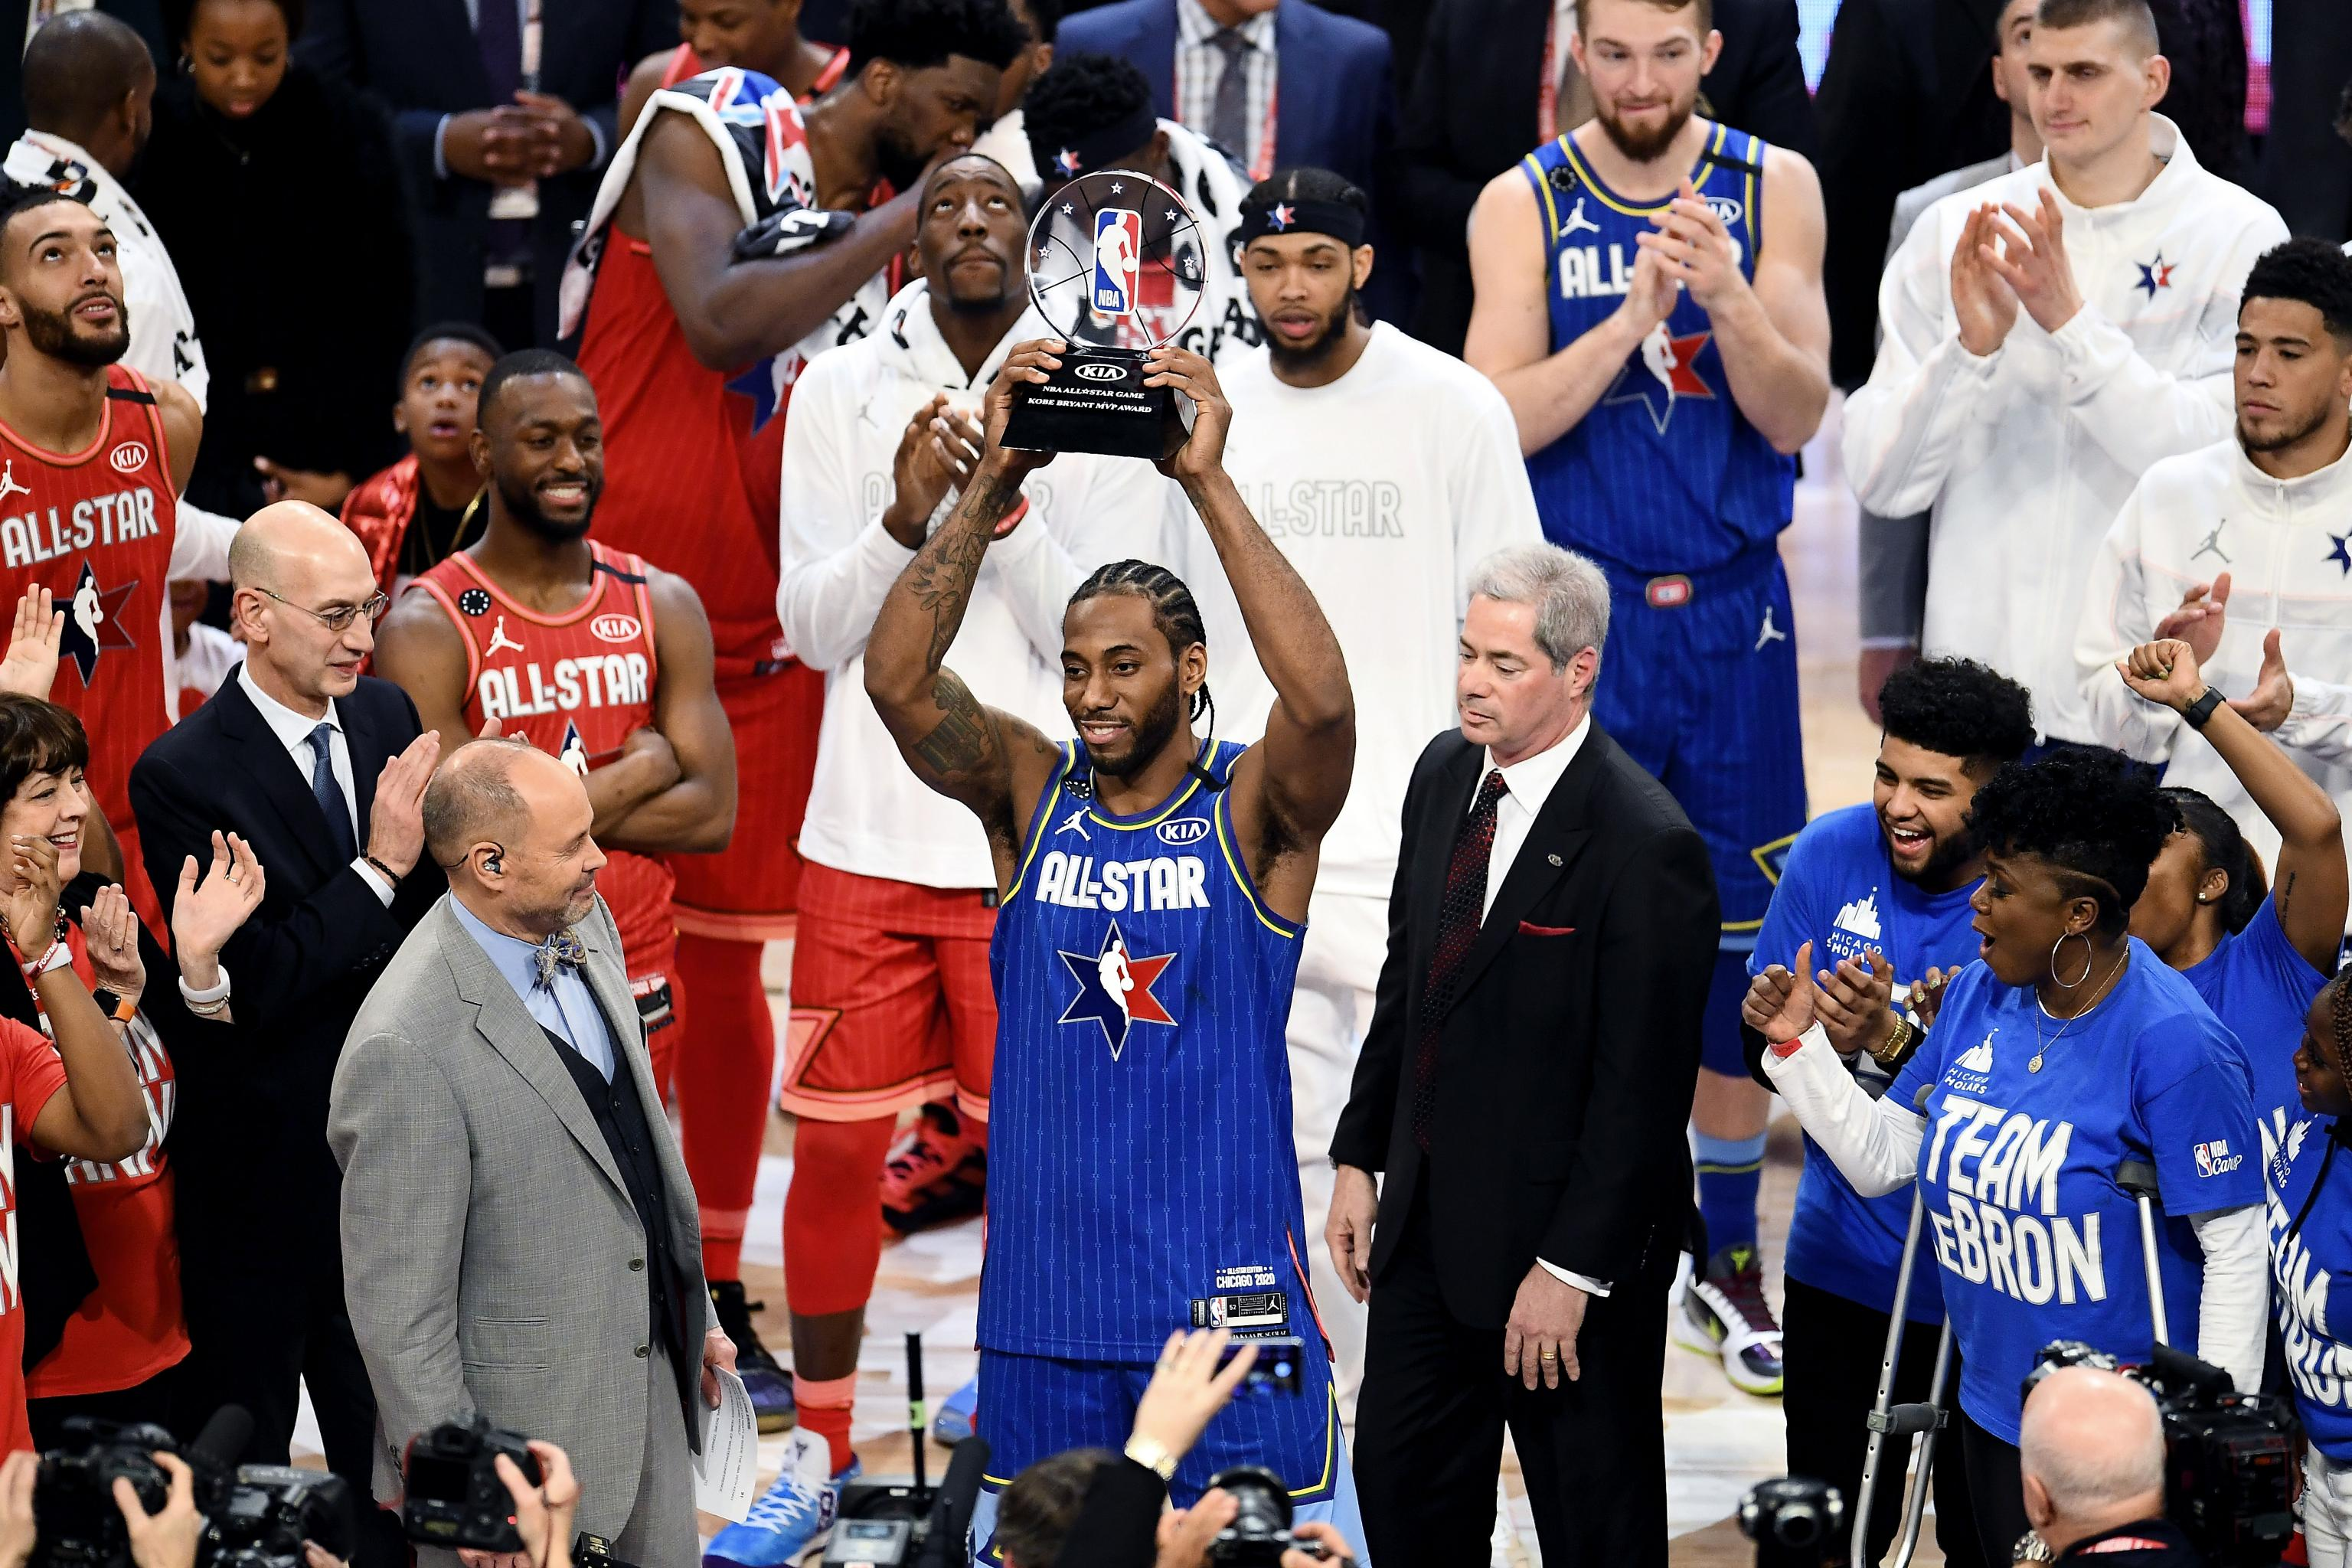 ALL STAR GAME 2020 : All-Star Game NBA. La Team LeBron sacrée